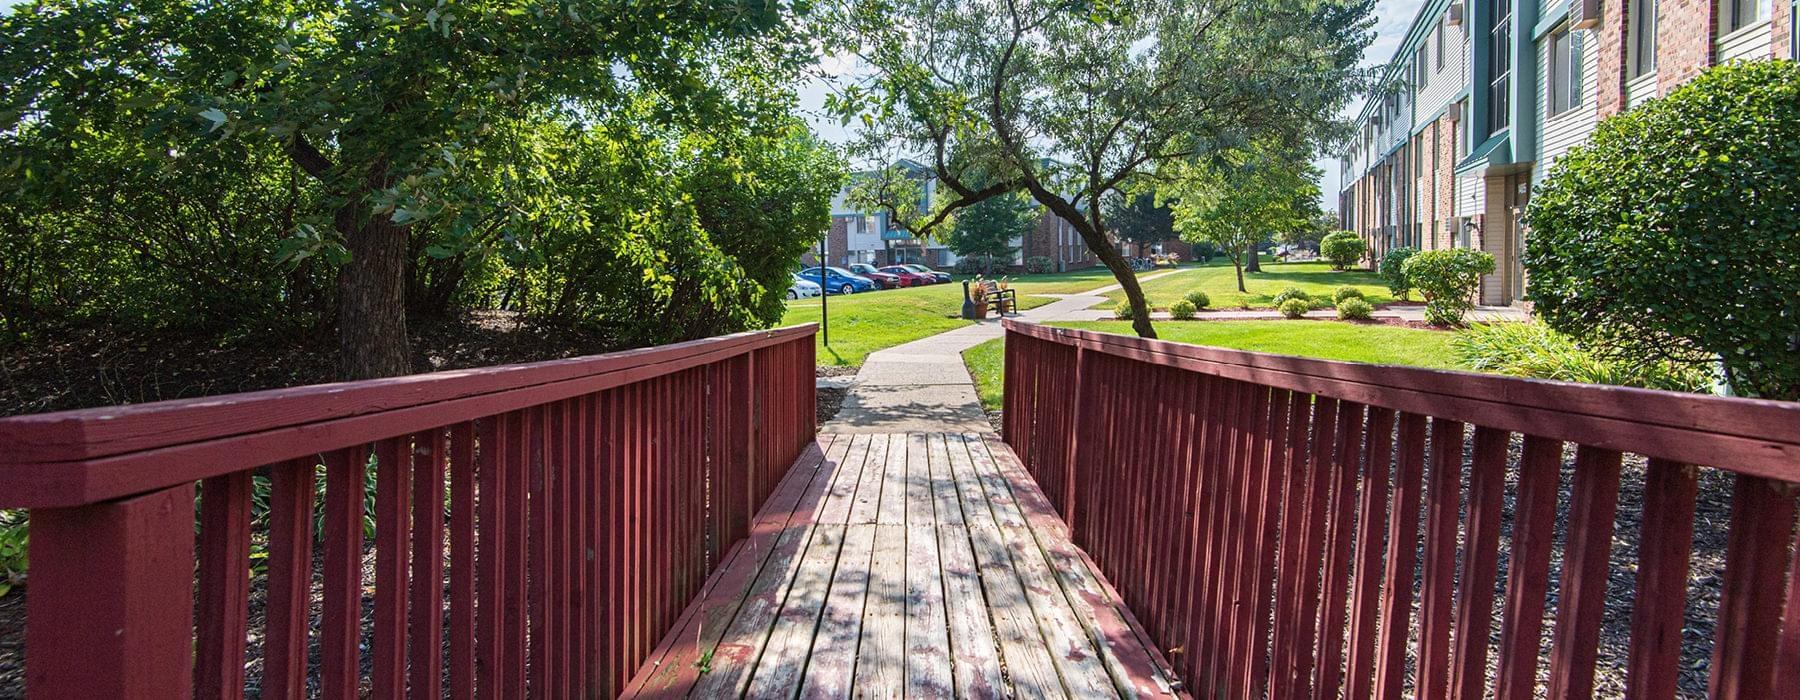 wooden bridge connects walking path near Como Park apartments